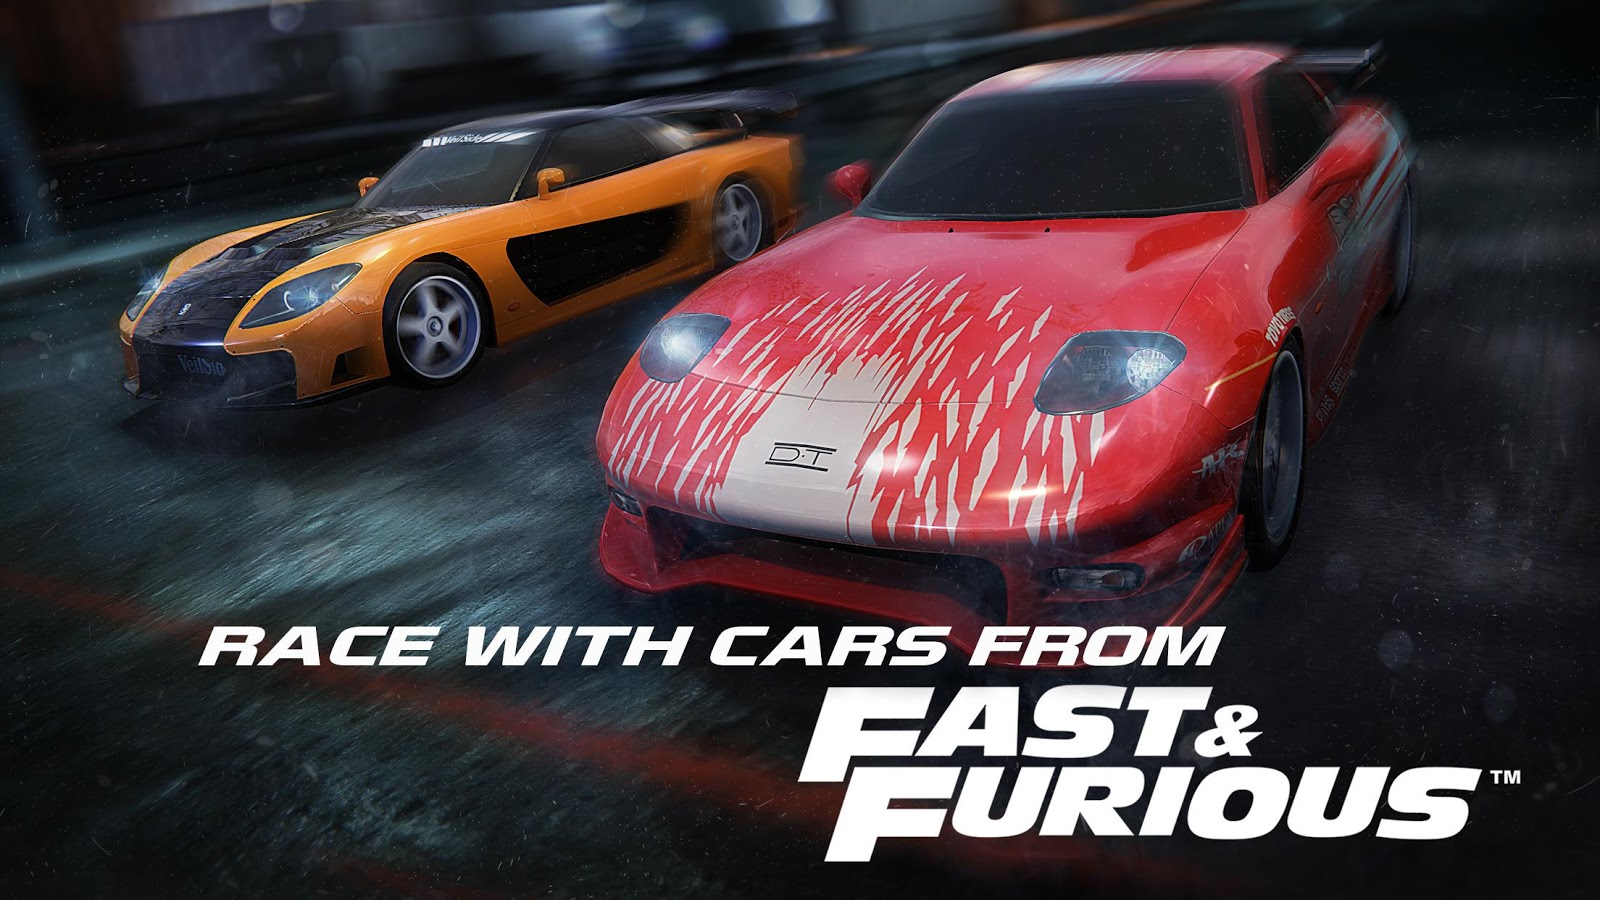 Scratch how to make a car game youtube - Racing Rivals Screenshot